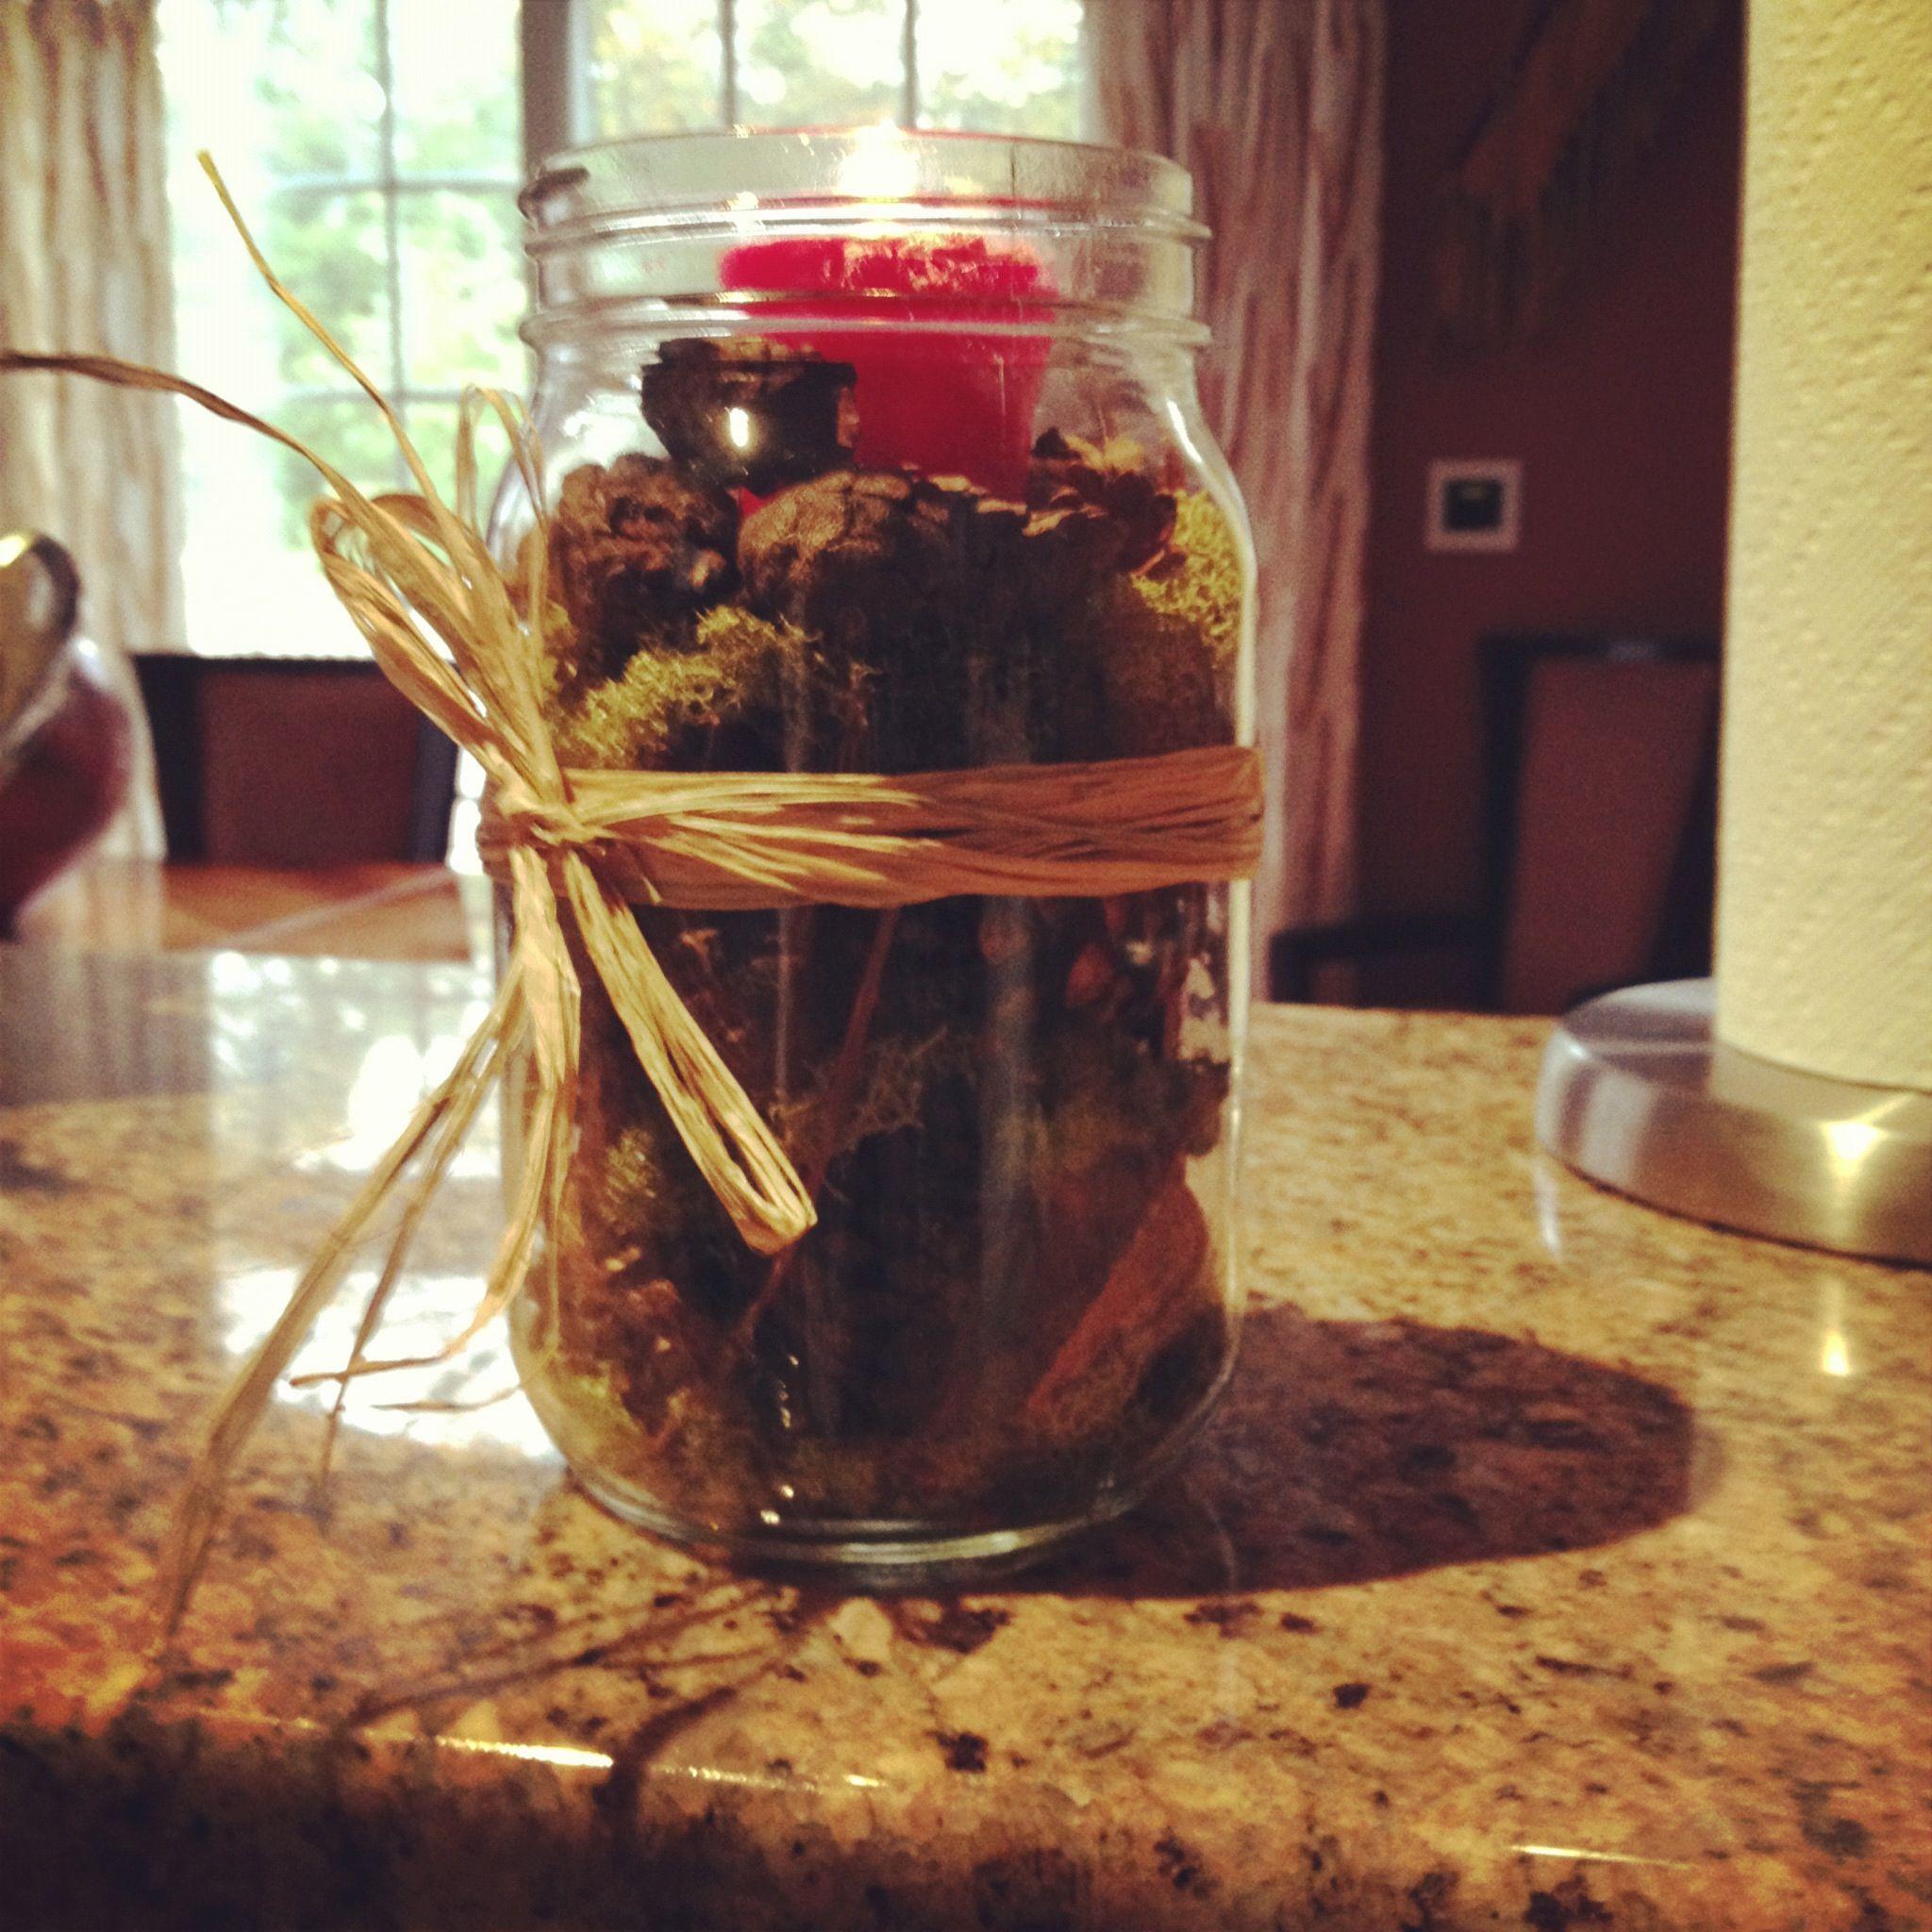 Fall mason jar DIY candle. (Moss,scented pinecones, cloves, cinnamon sticks